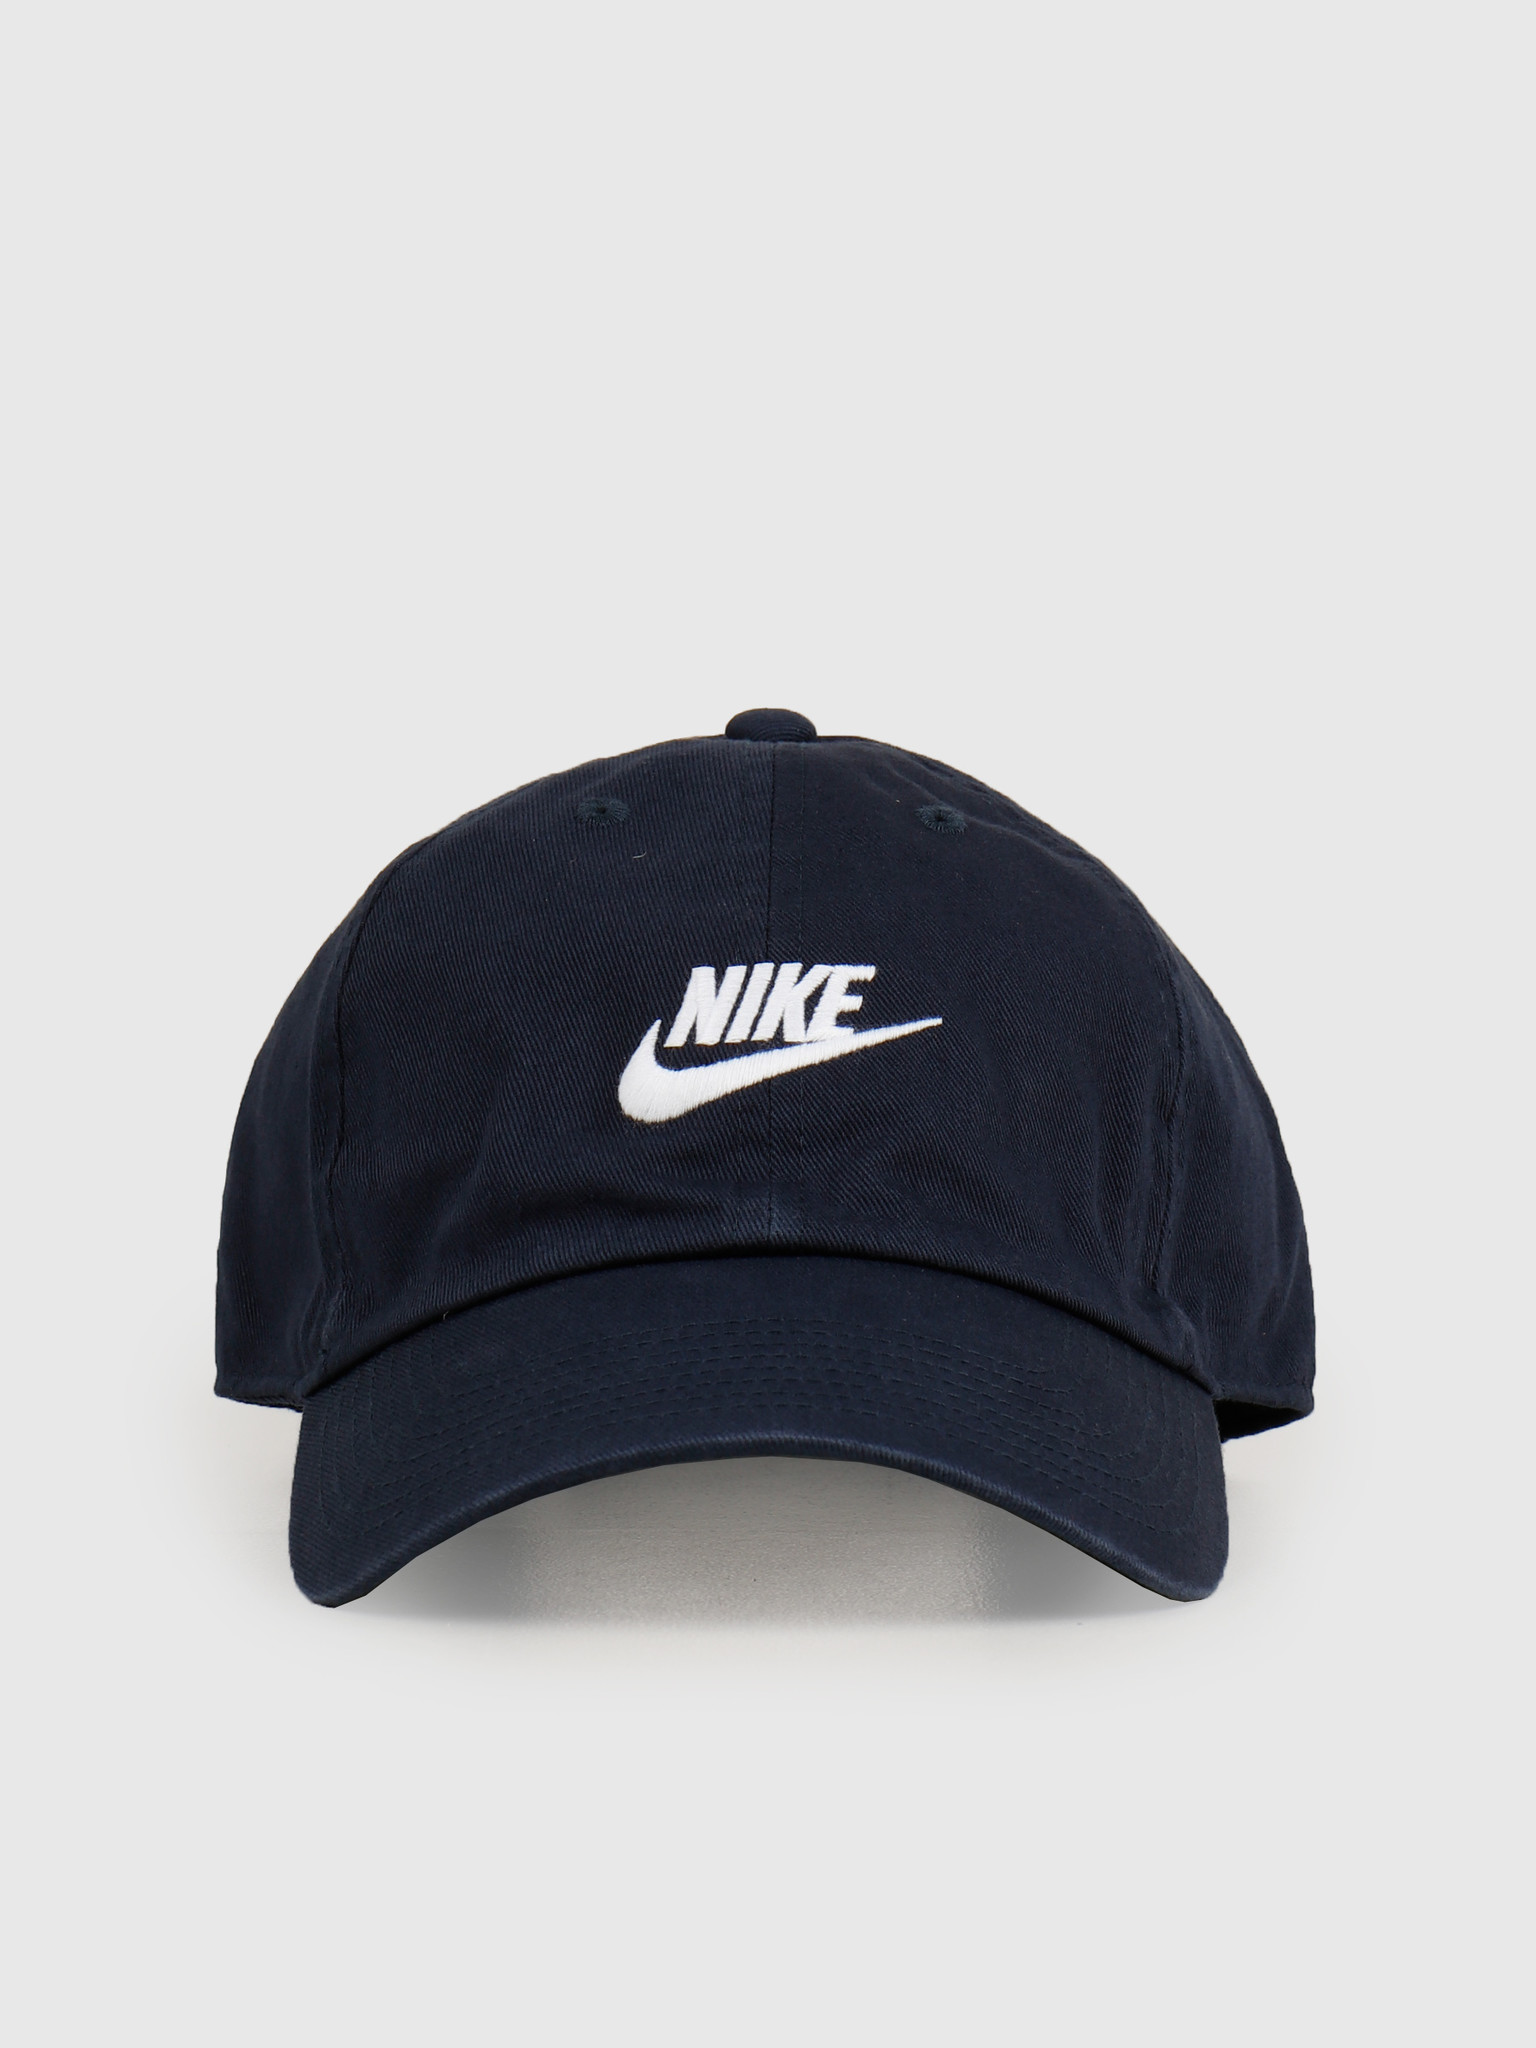 Nike Nike  NSW H86 Cap Obsidian  Obsidian  White 913011-451